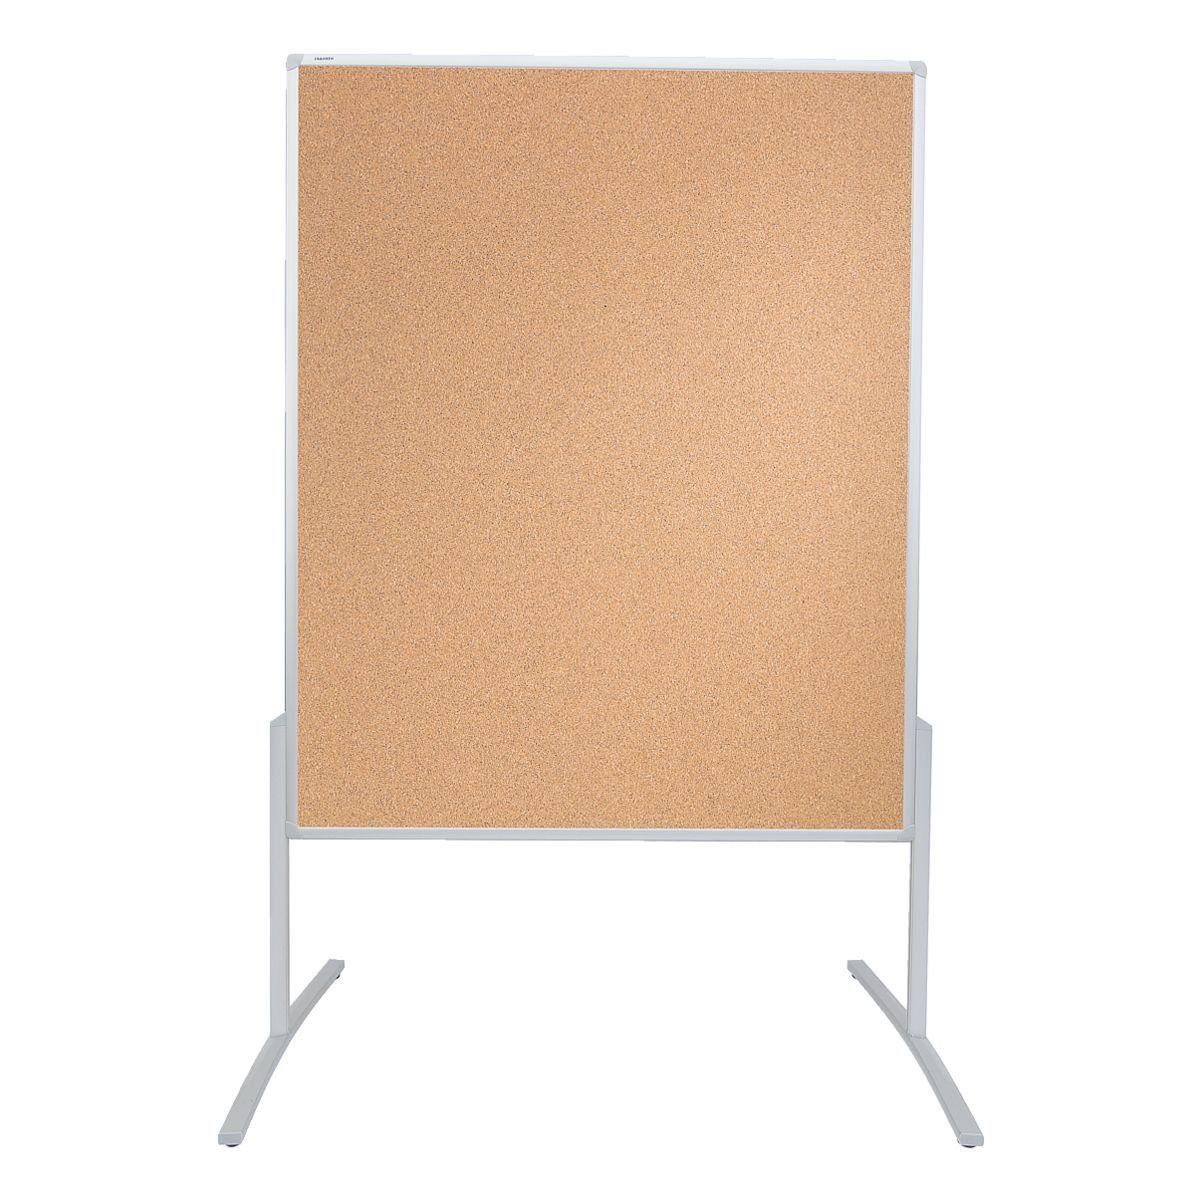 FRANKEN Moderationswand Kork 120/150 cm »PRO MT8004«